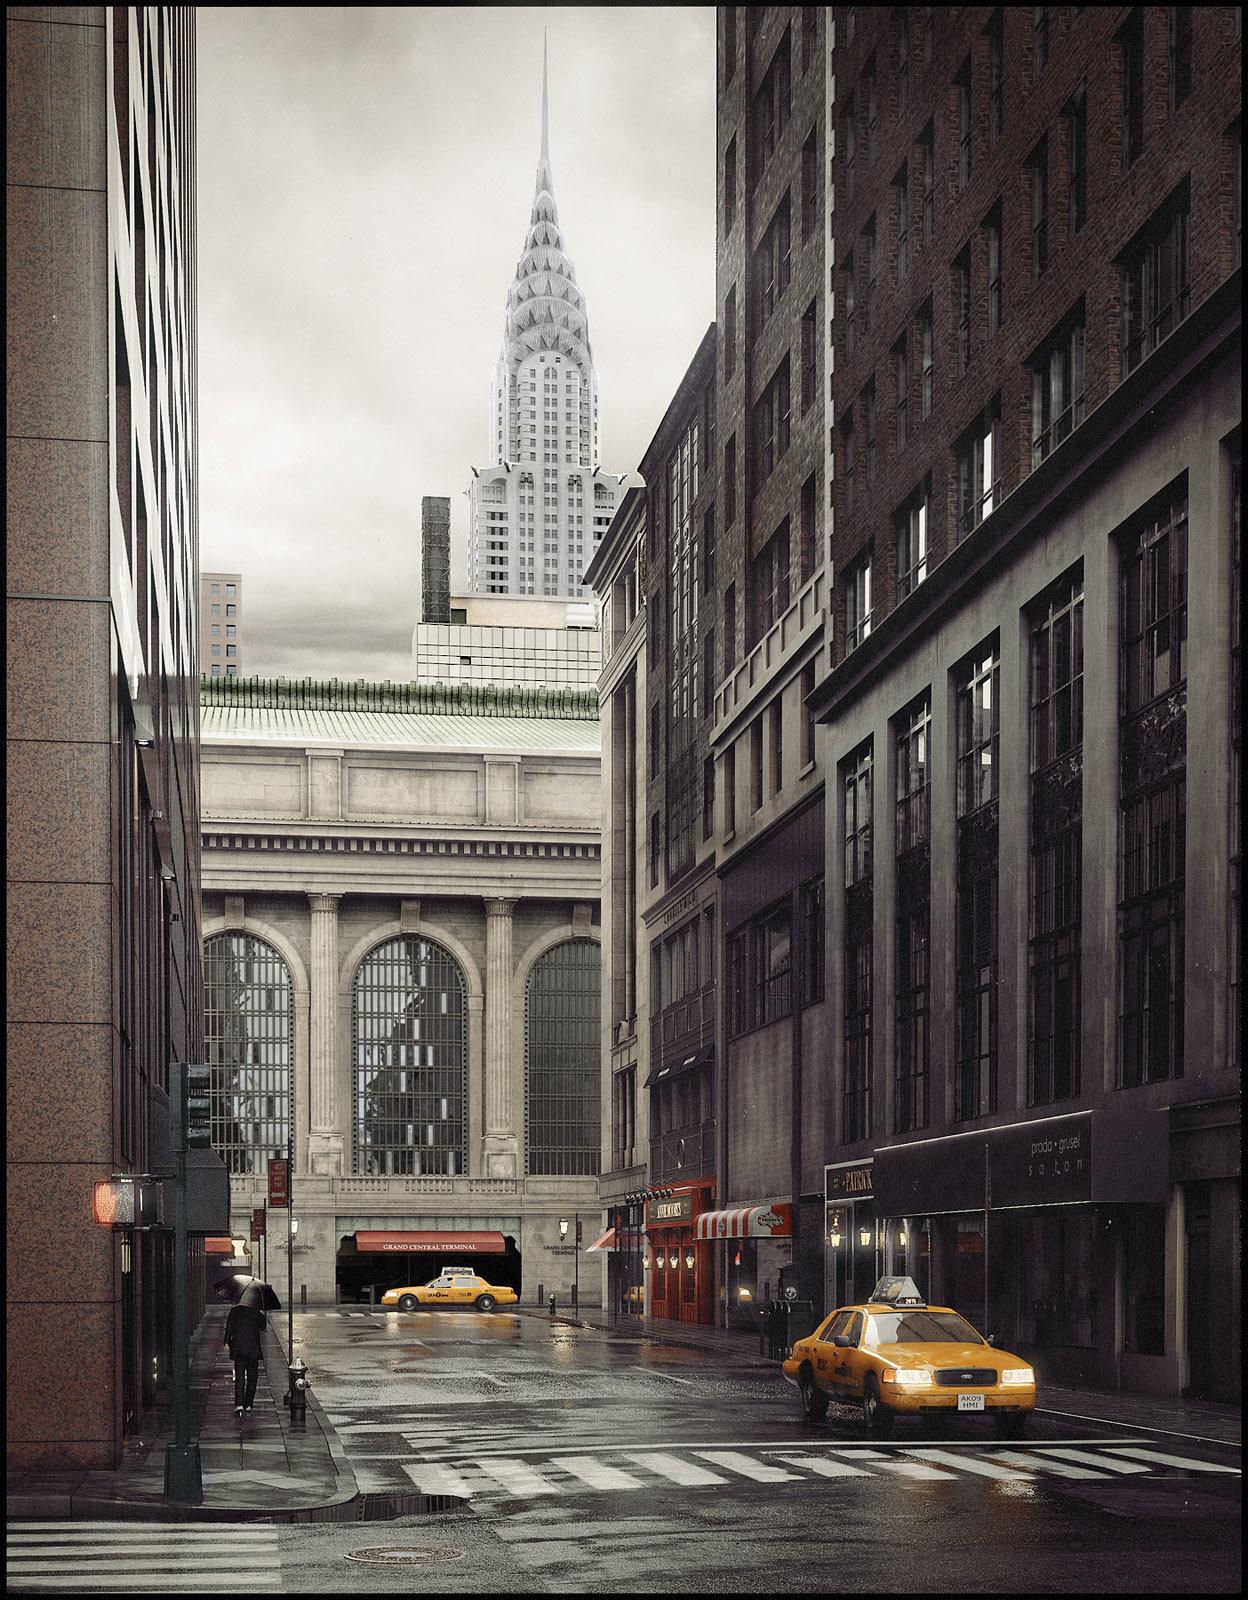 Latter new york 43rd street 1 07c825f8 jhzt